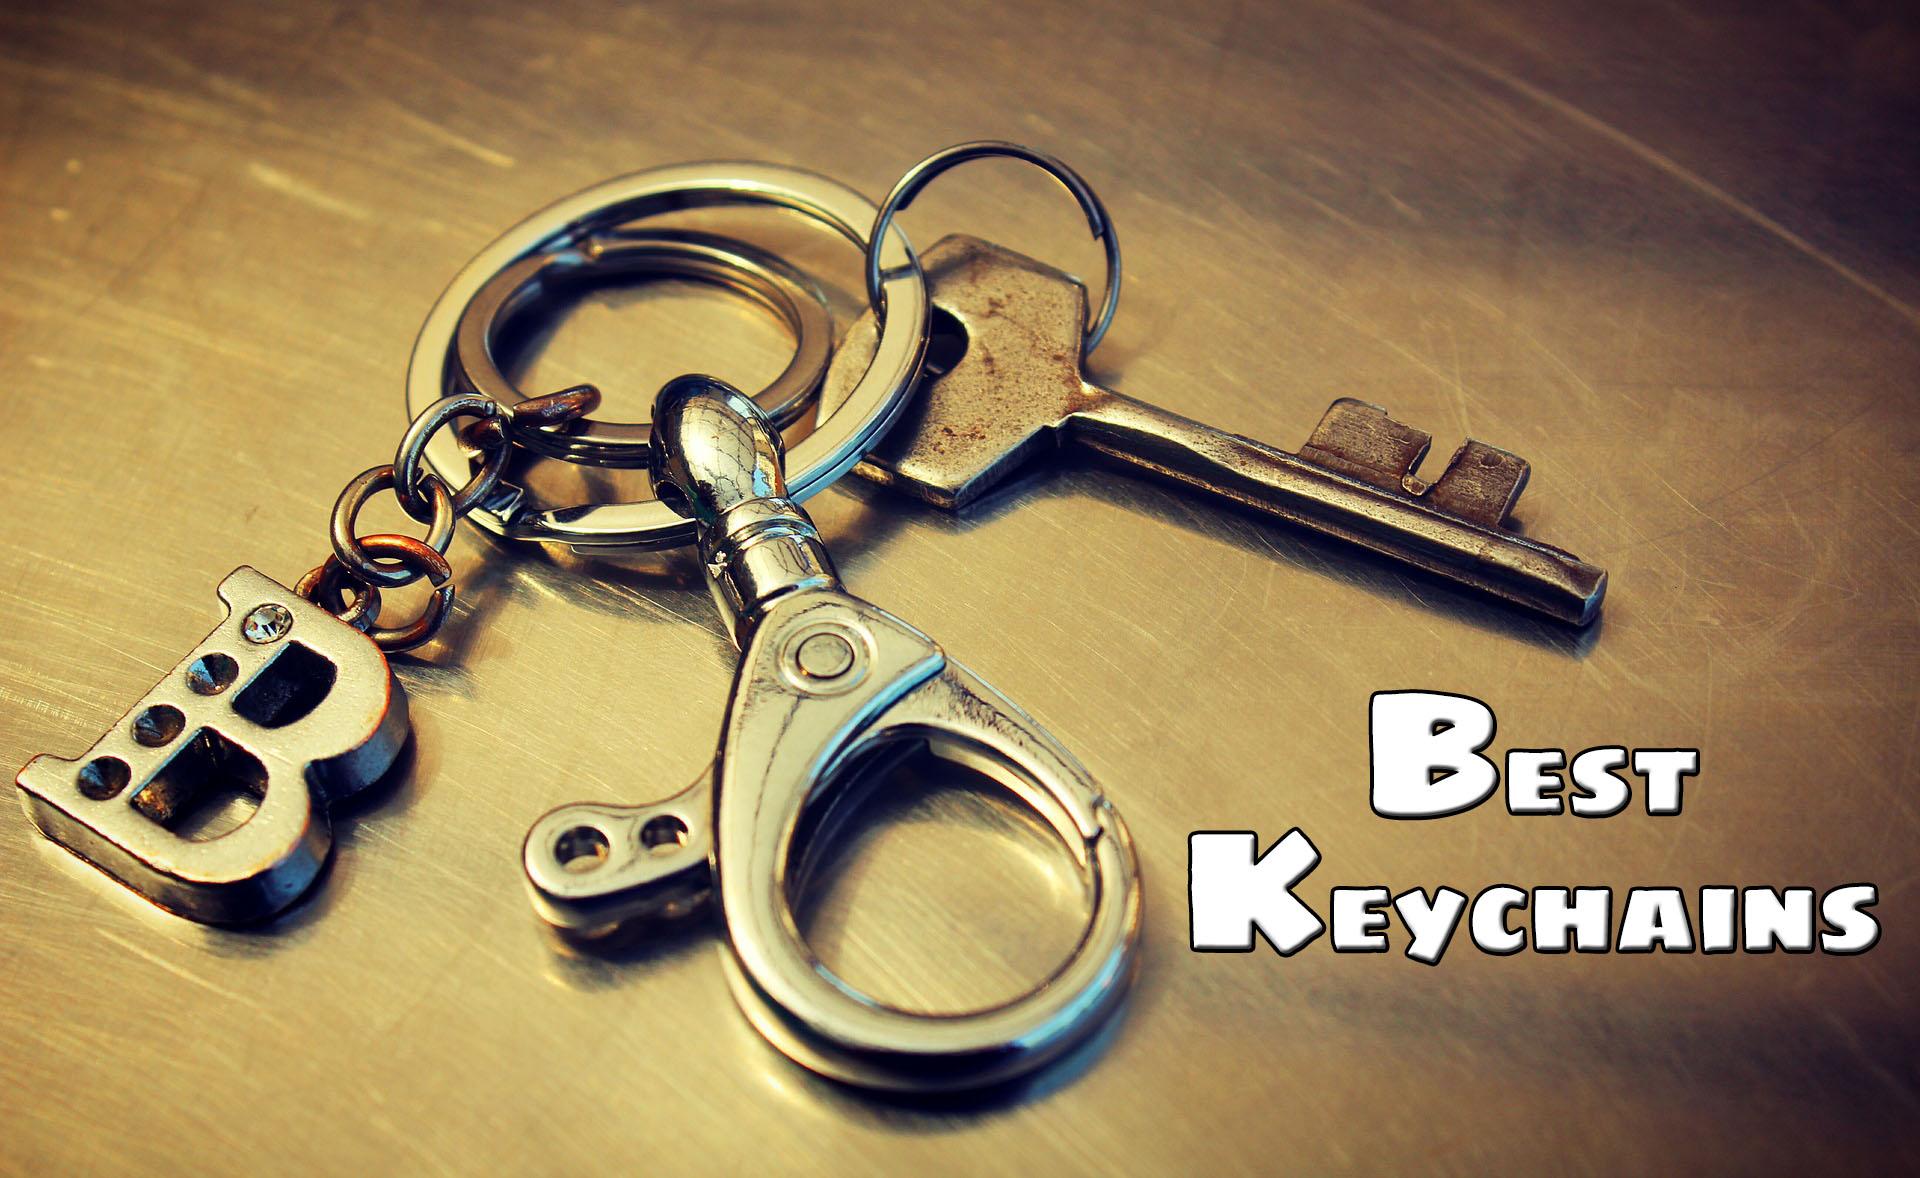 Best Keychain For Bike